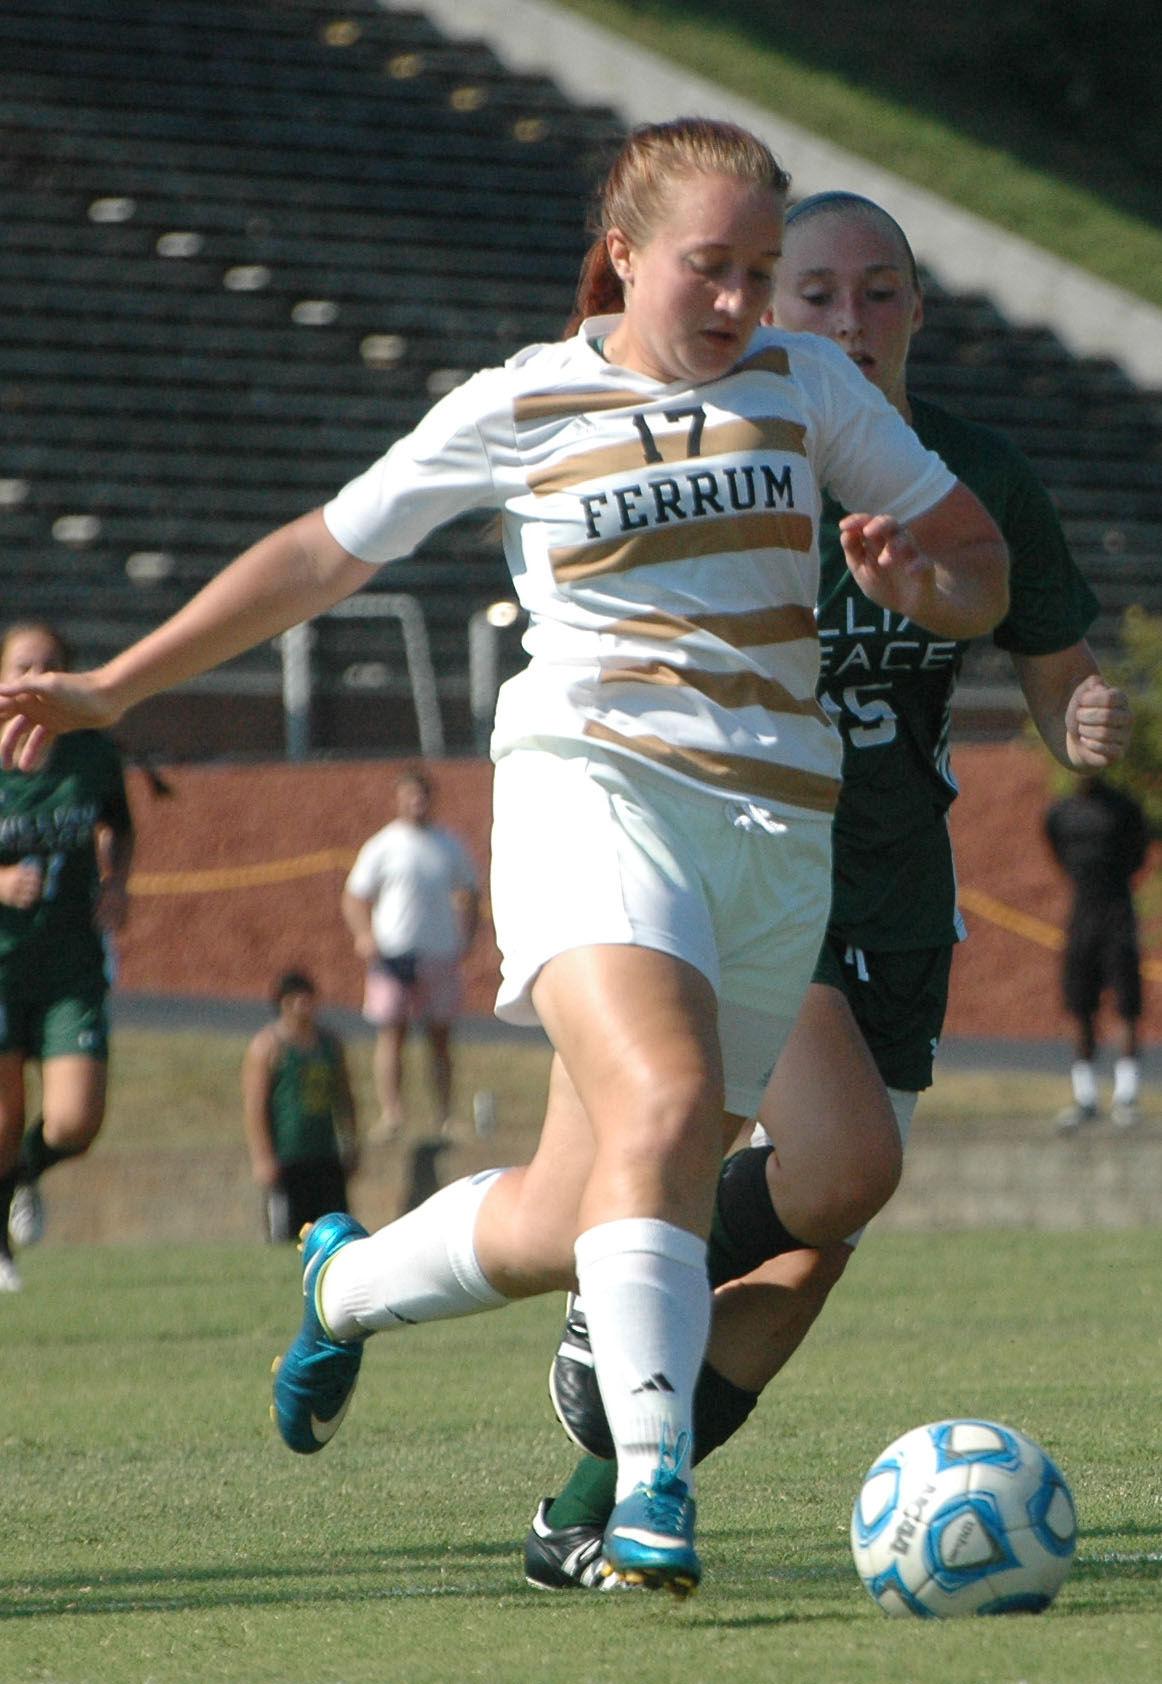 ferrum women Emory & henry women's soccer shuts out hollins,  ferrum women's soccer tops emory & henry 2-0, wednesday in non-conference action september 20, 2017.